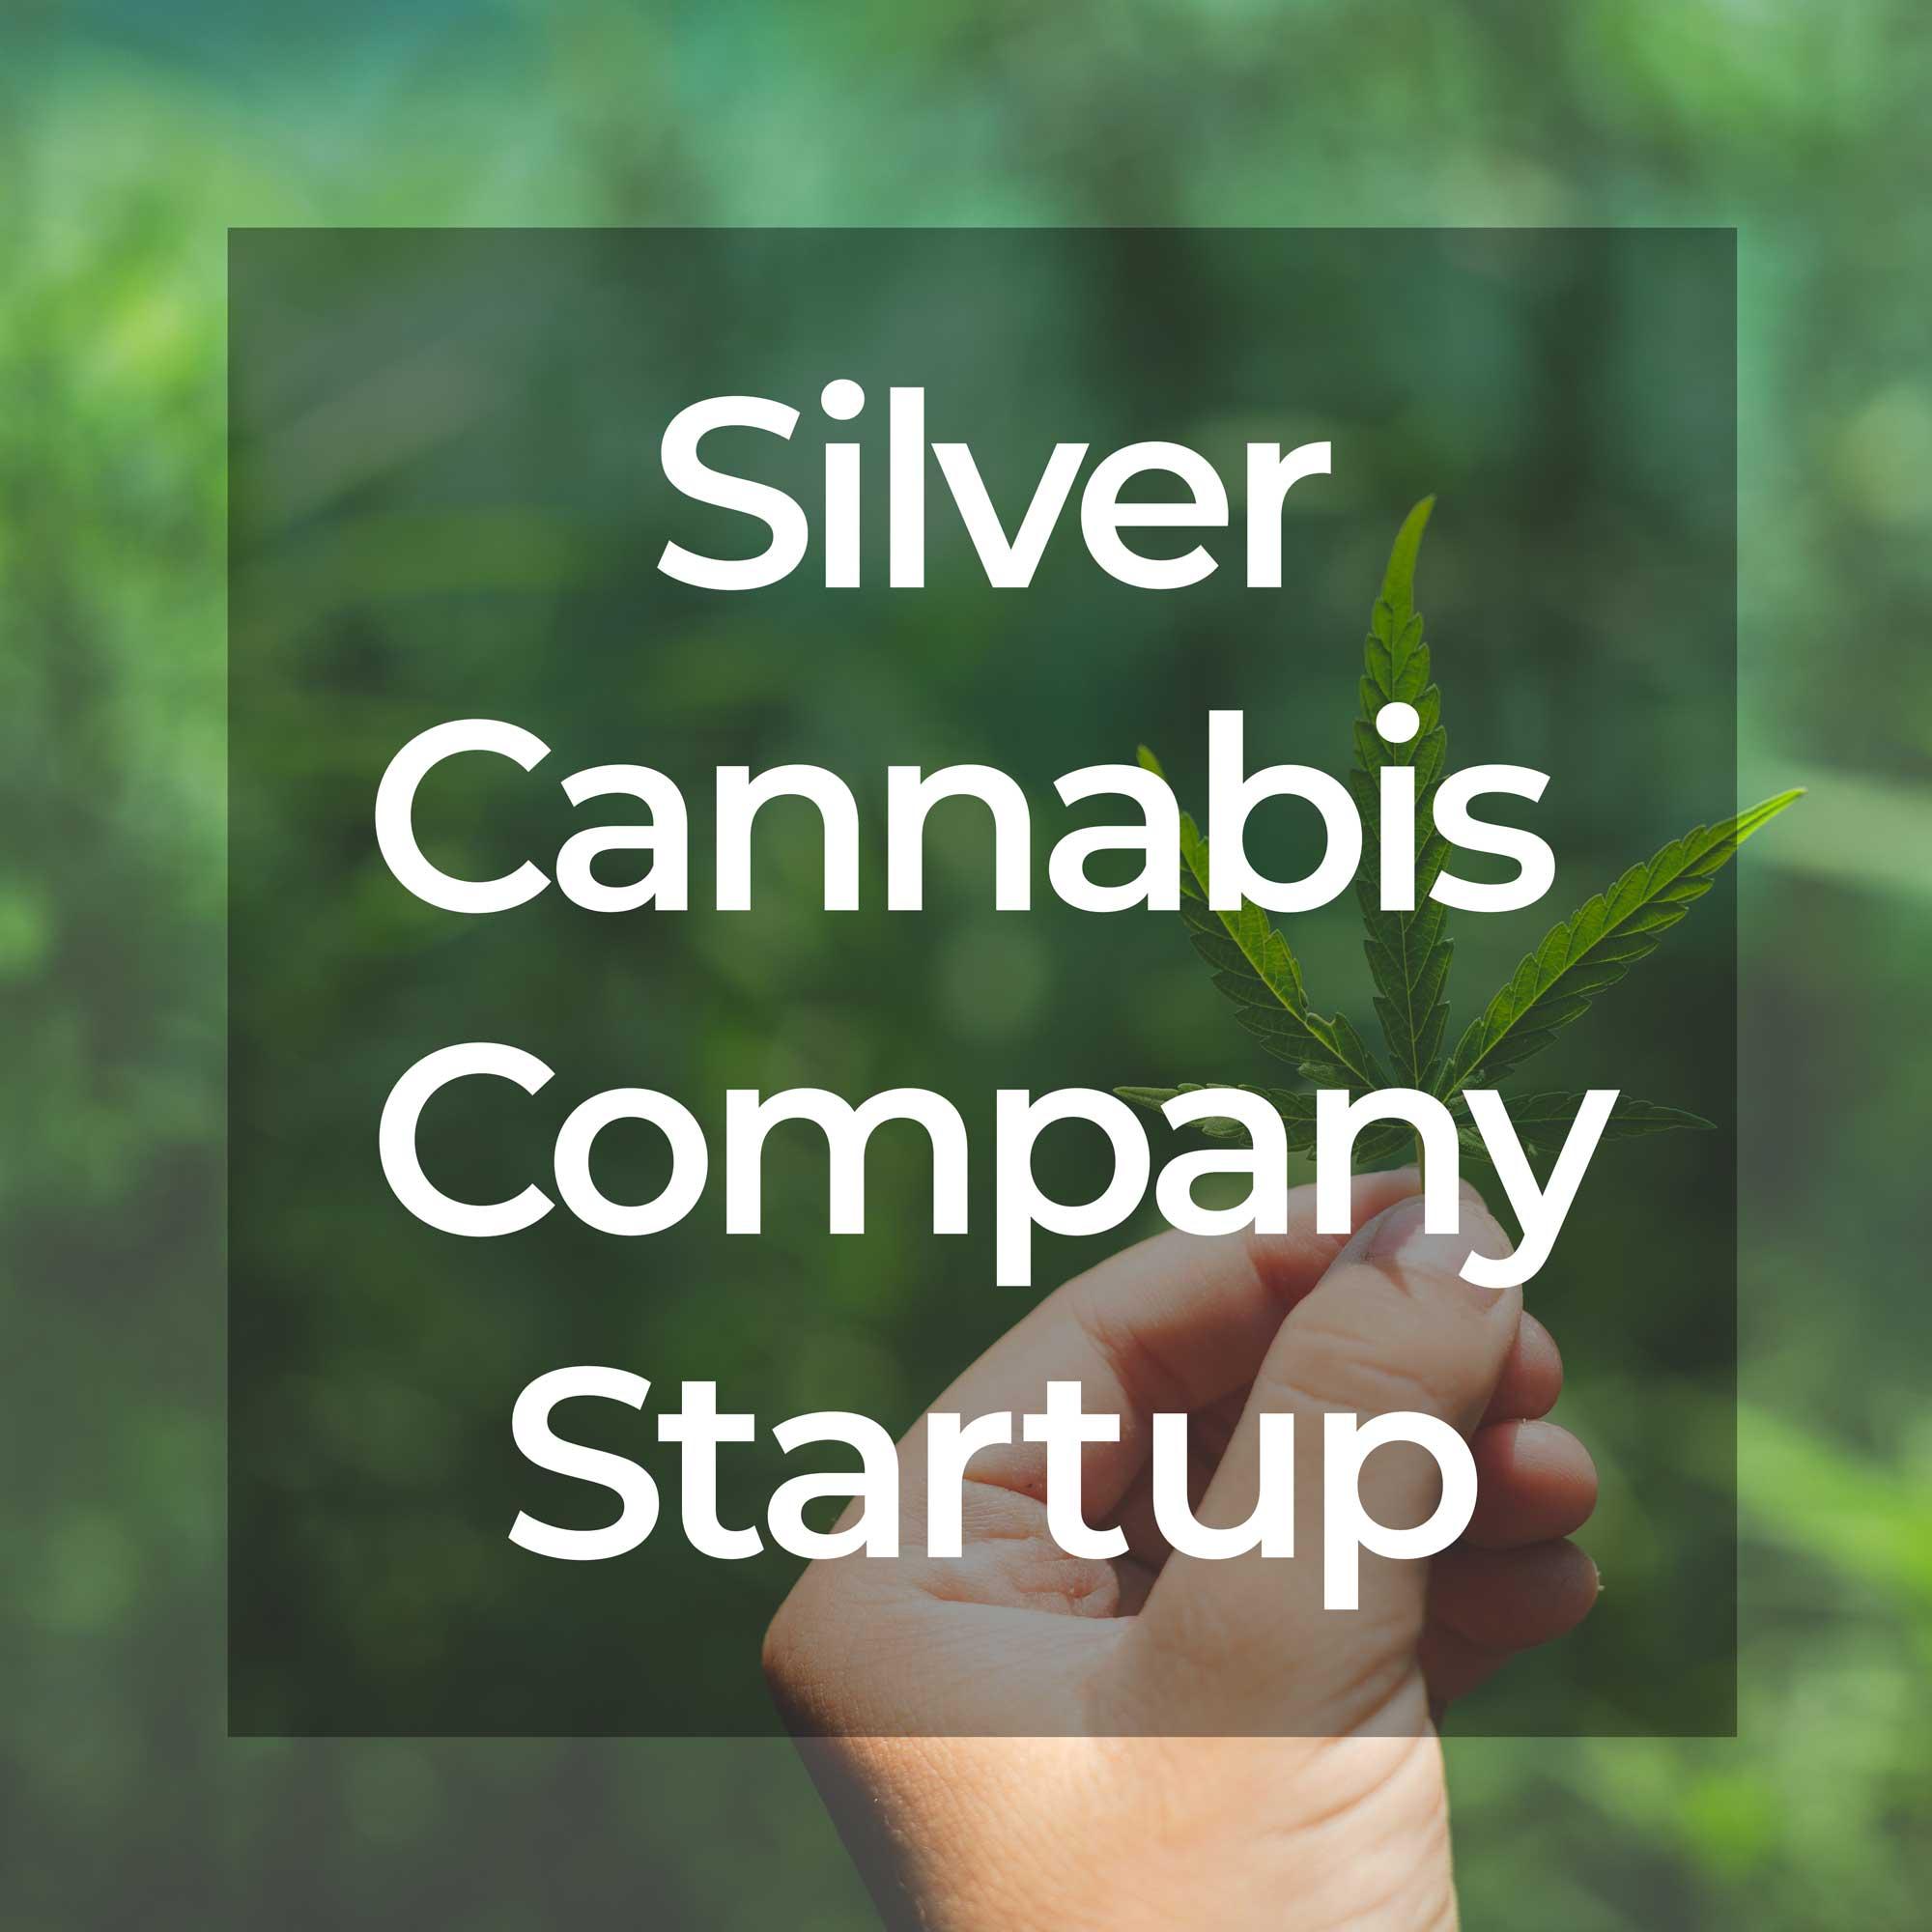 Silver Cannabis Company Startup